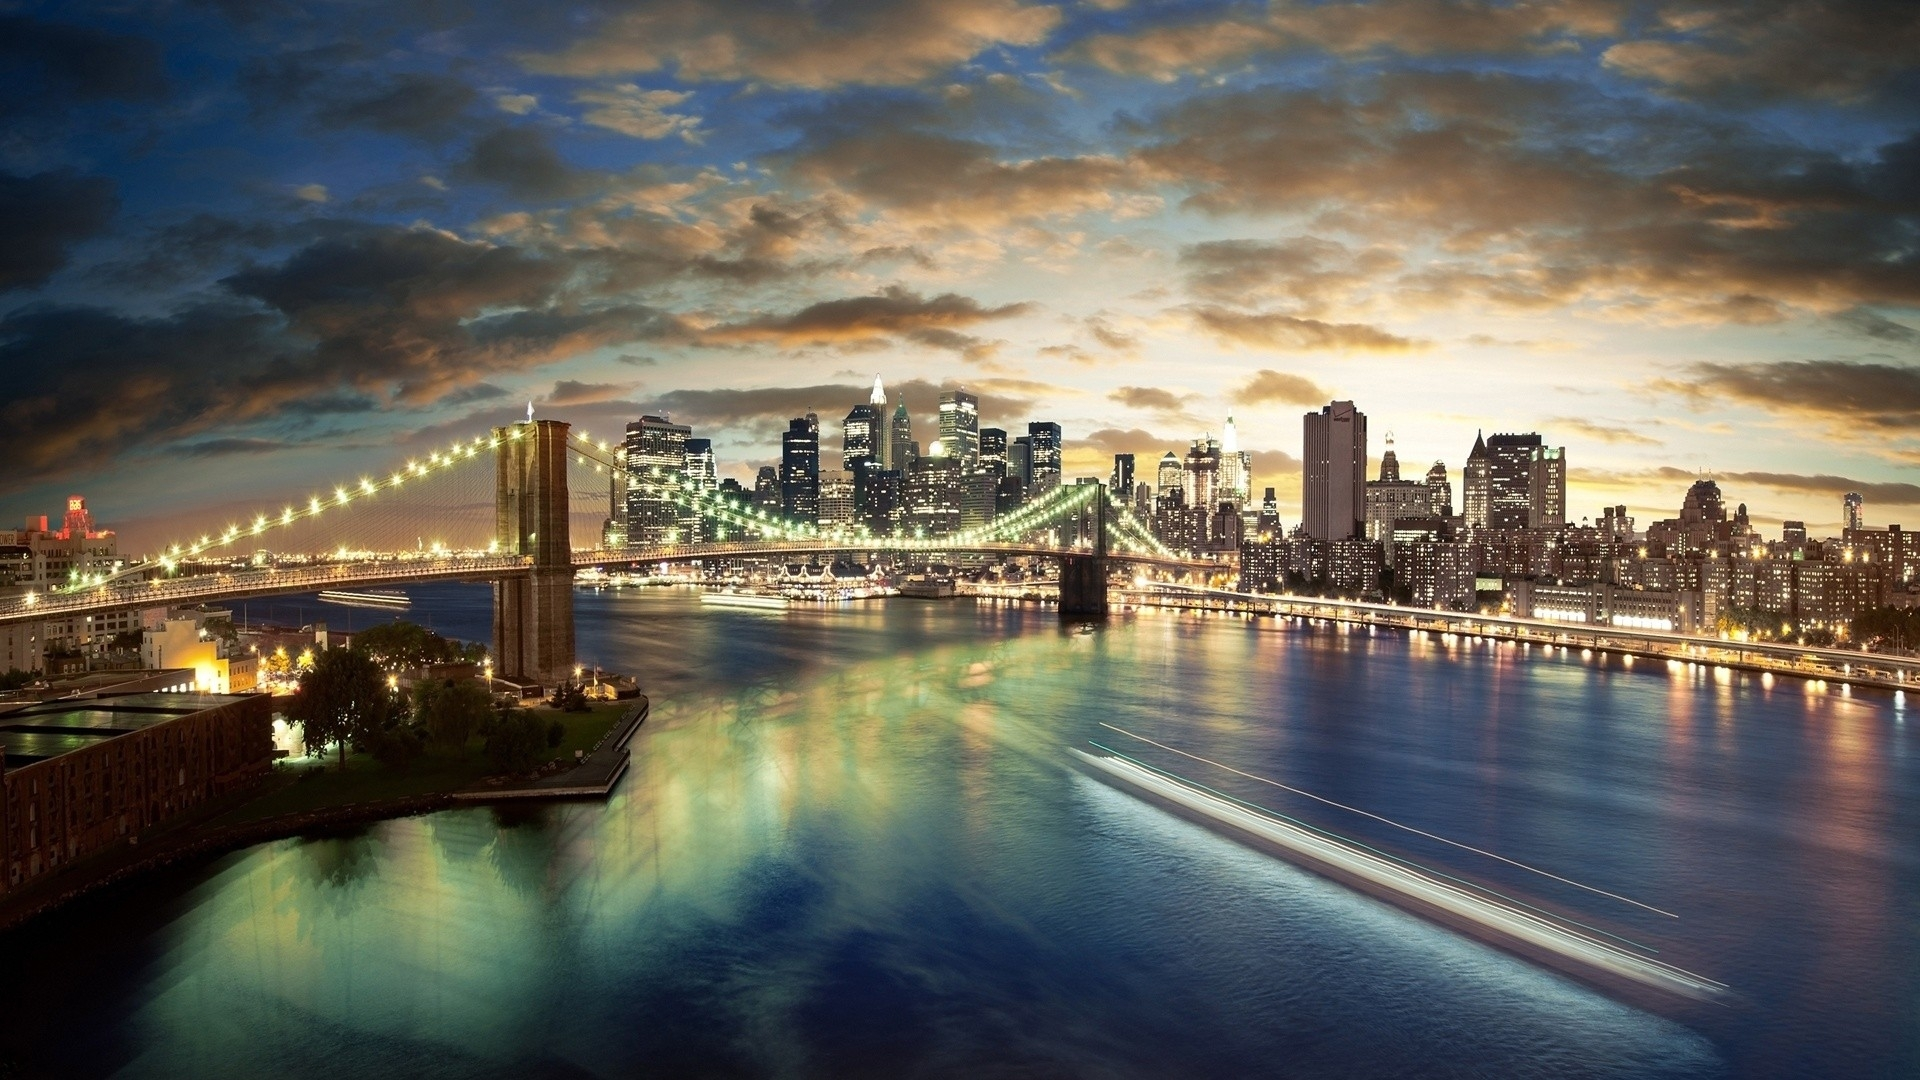 brooklyn bridge night skyline photography wall #2366 wallpaper   dexab